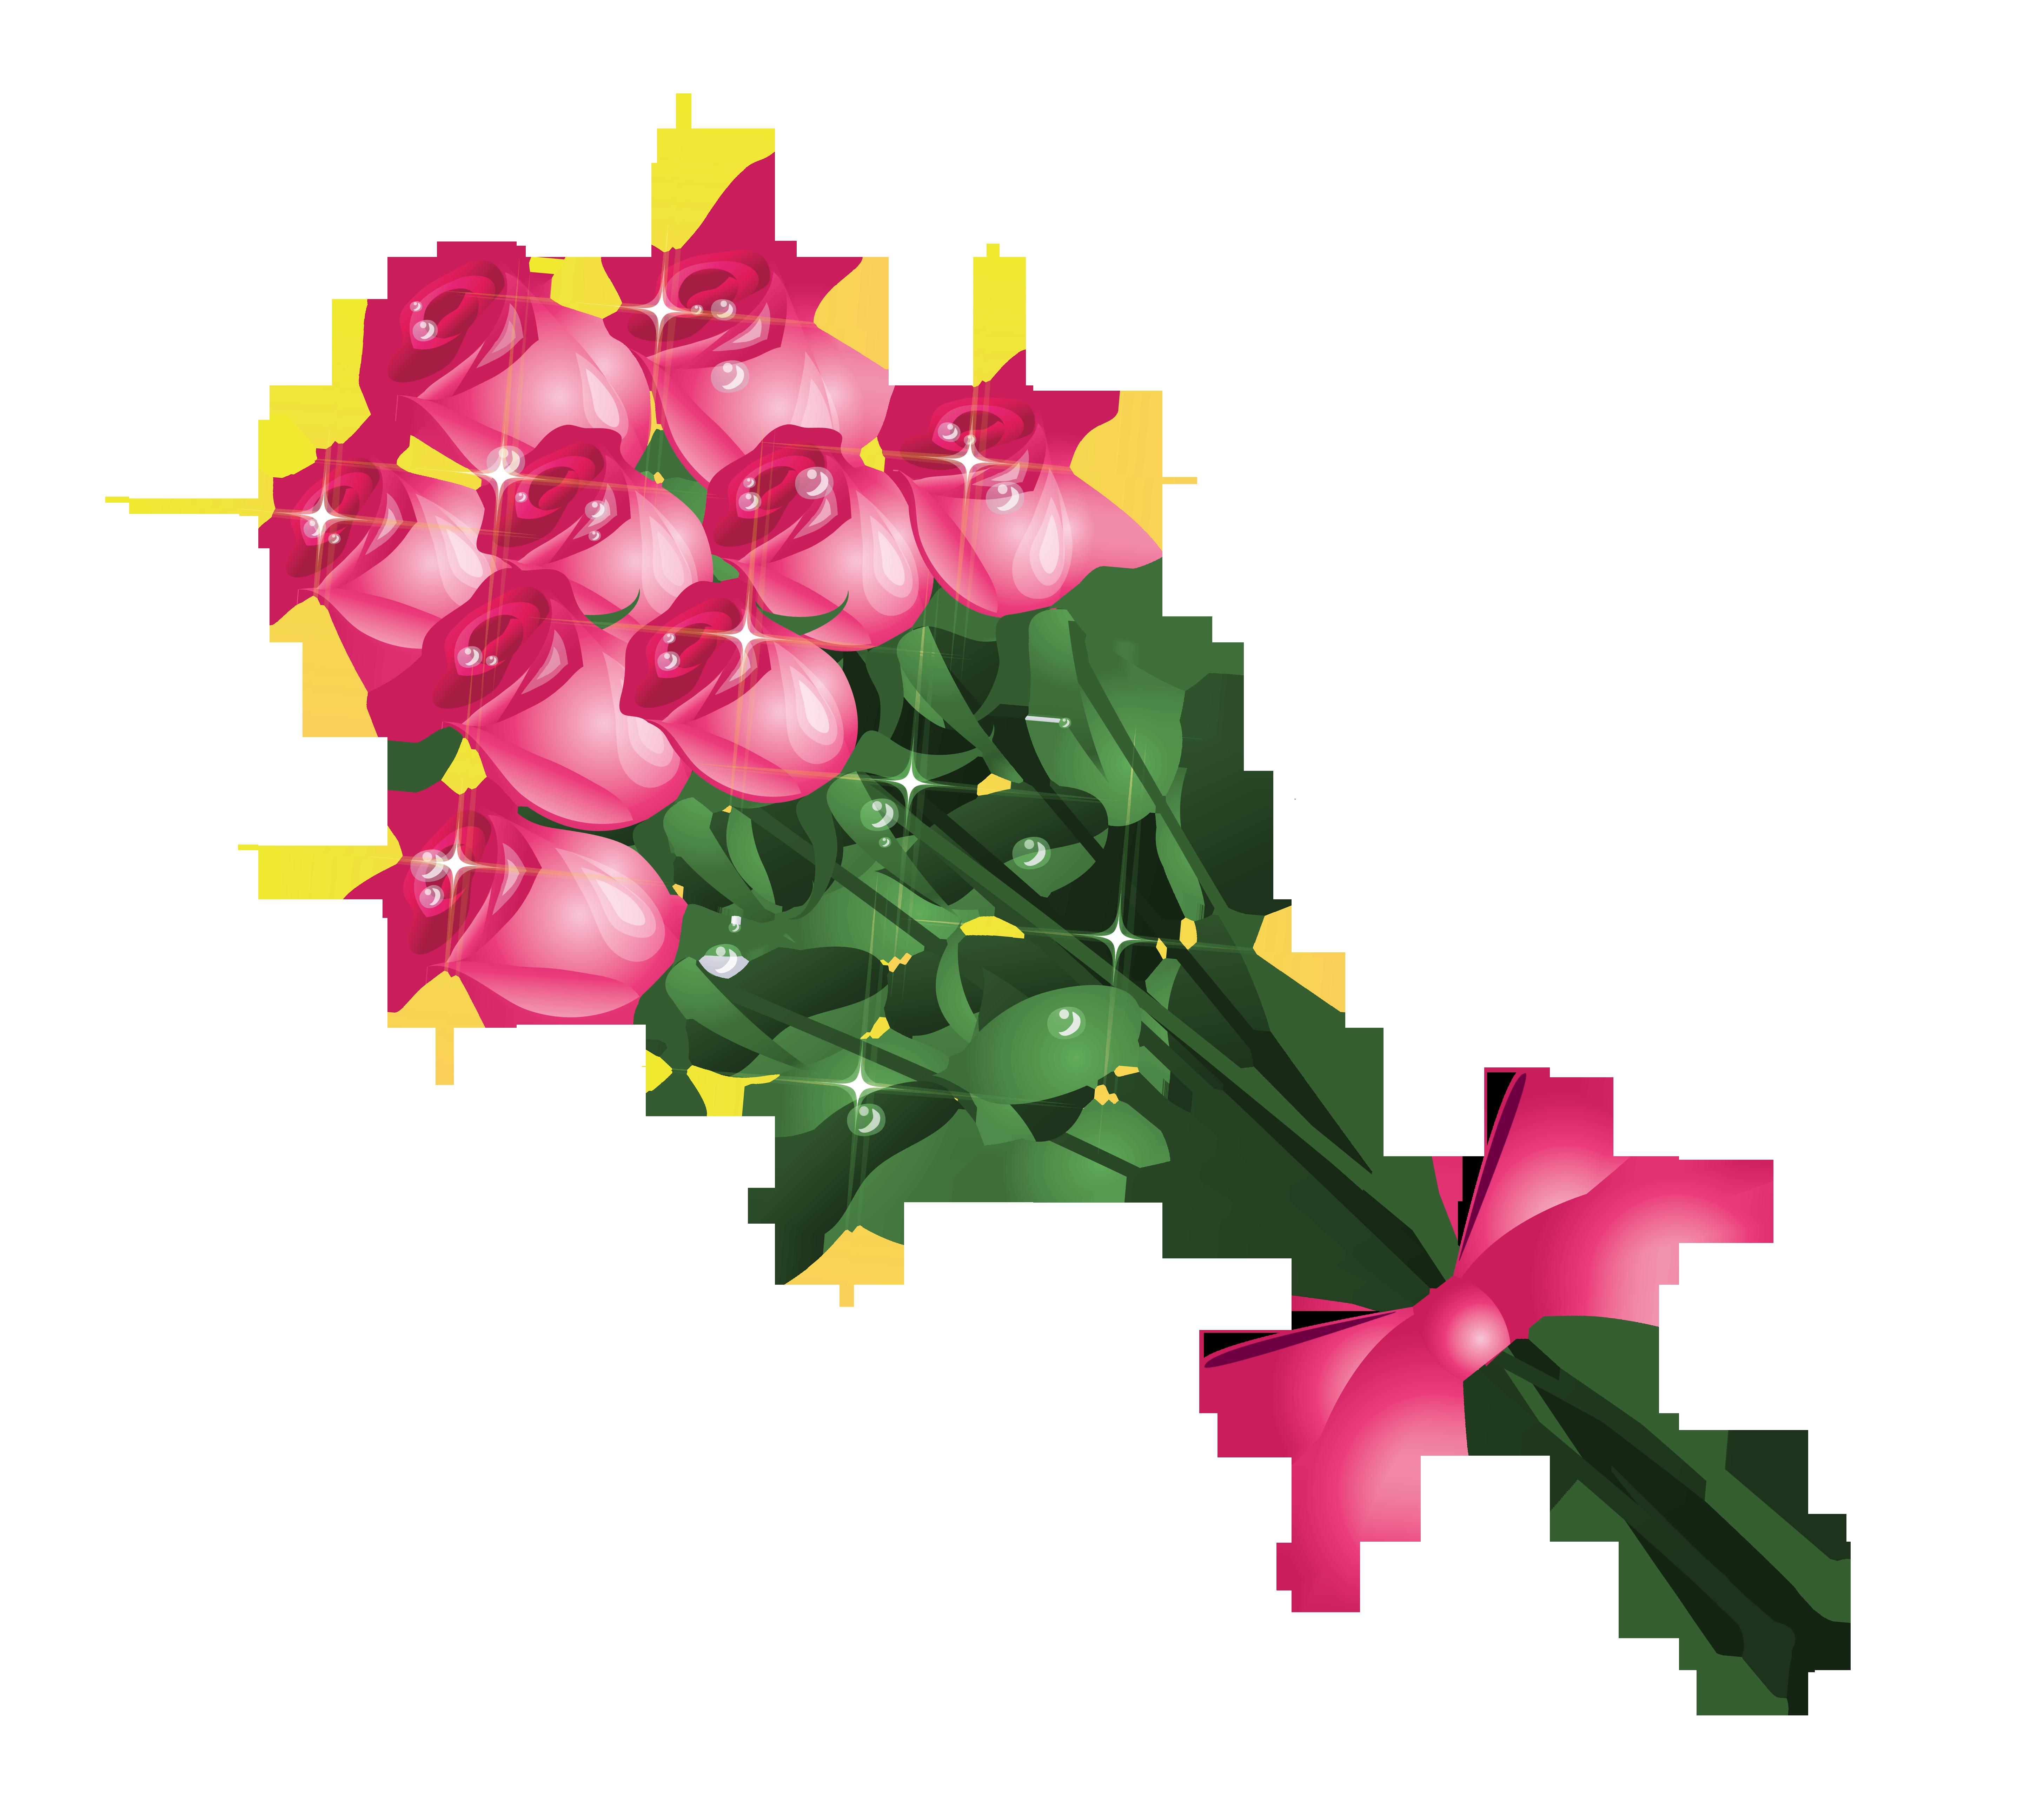 5747x5185 Transparent Pink Roses Bouquet Png Clipart Pictureu200b Gallery